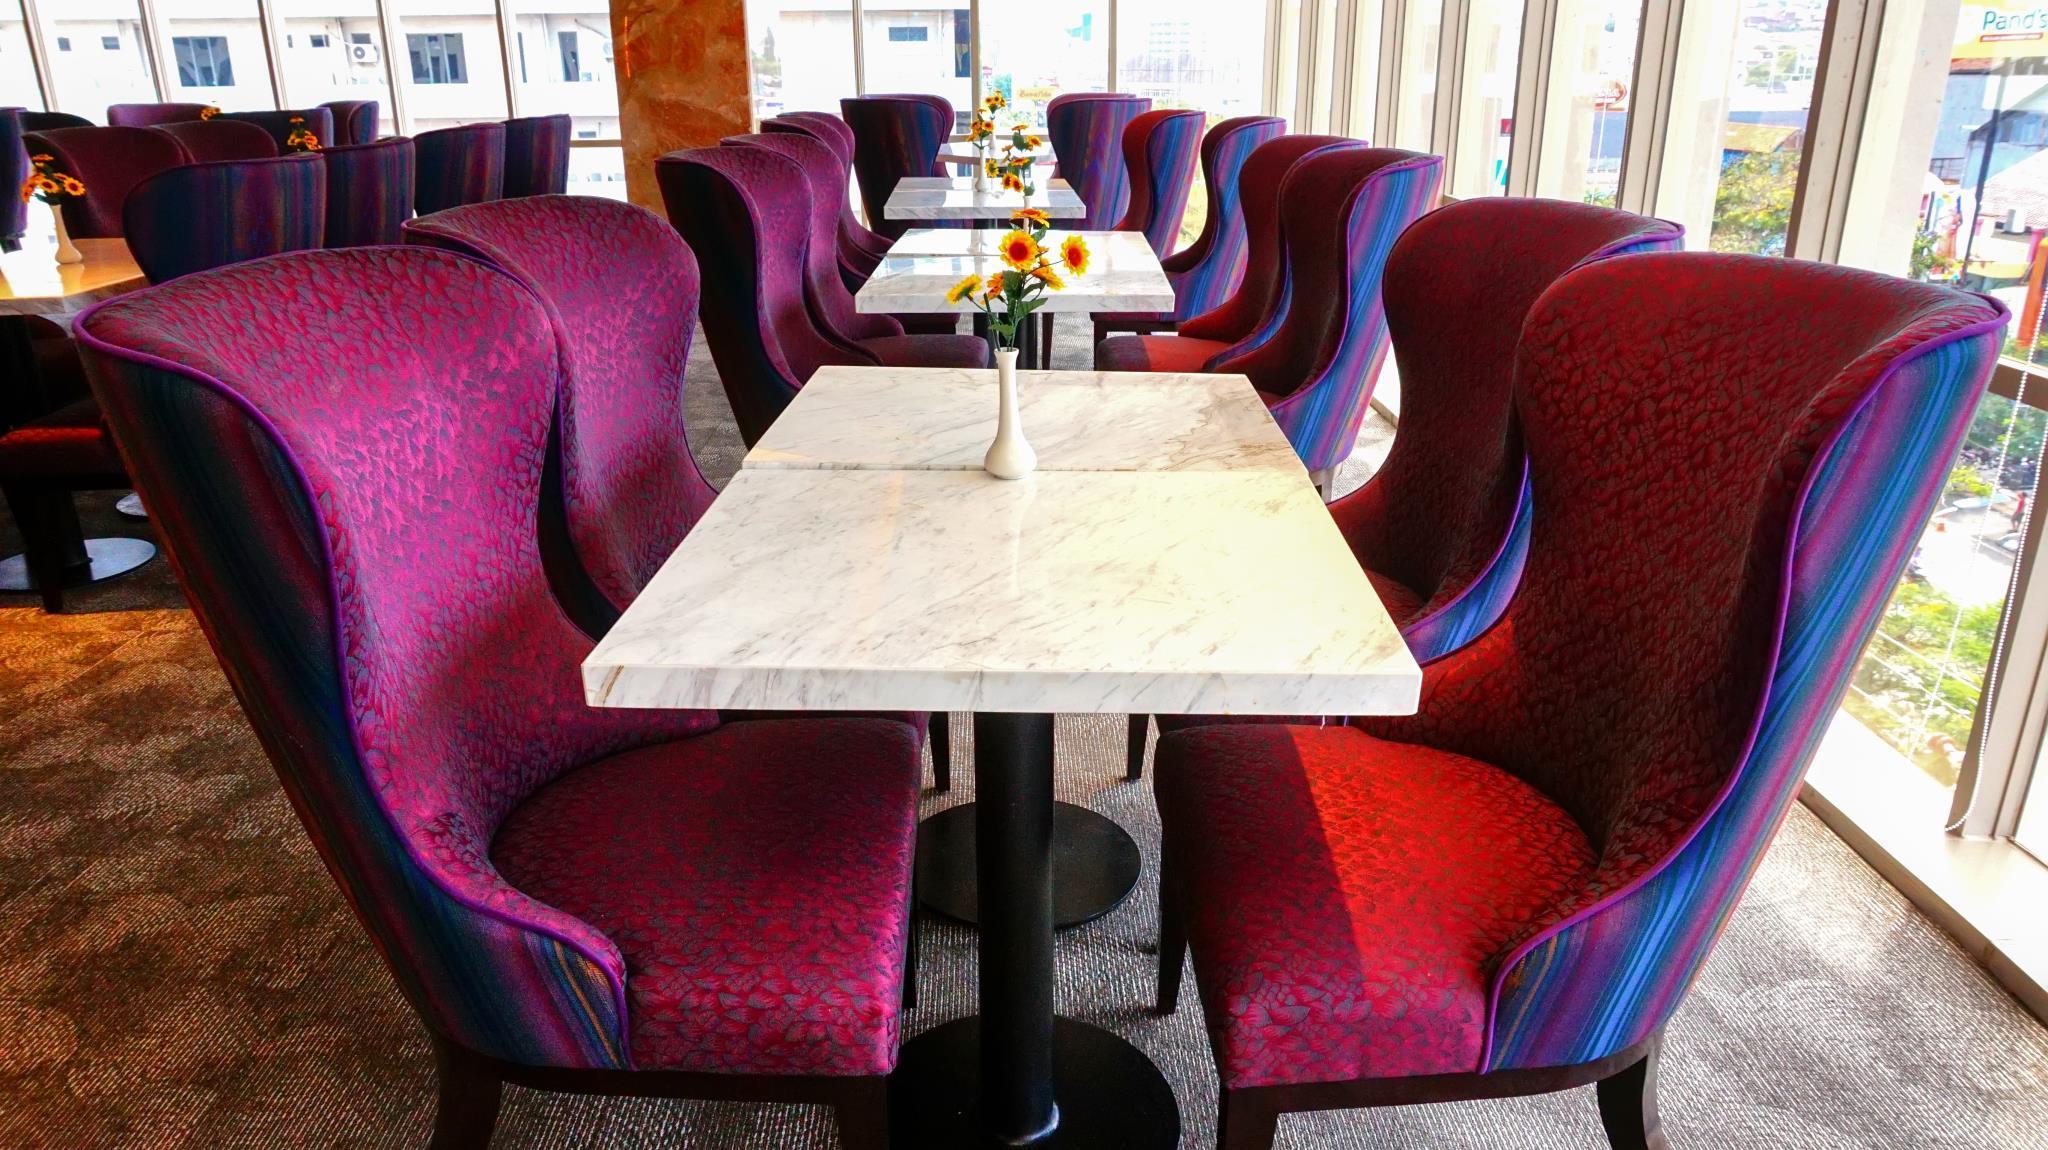 Louis Kienne Hotel Pandanaran Semarang 4 Star In Voucher Simpang 5 Previous Next